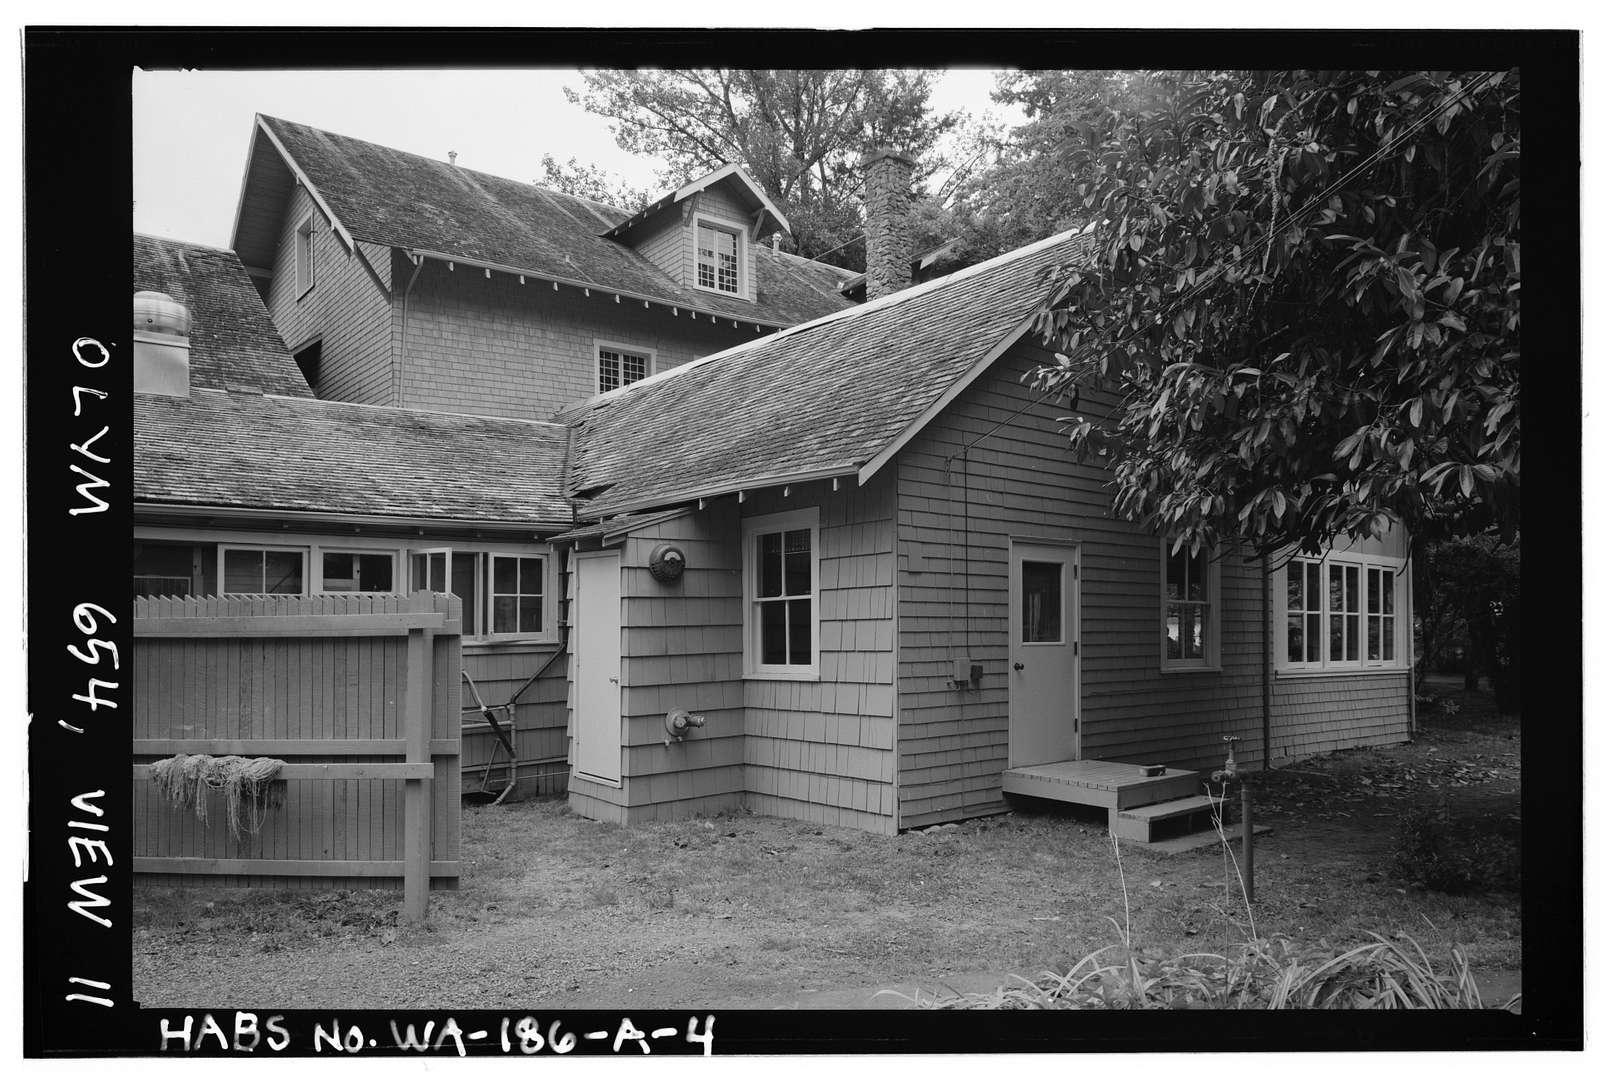 Singer's Lake Crescent Tavern, Lodge Building, Barnes Point, Lake Crescent, Port Angeles, Clallam County, WA